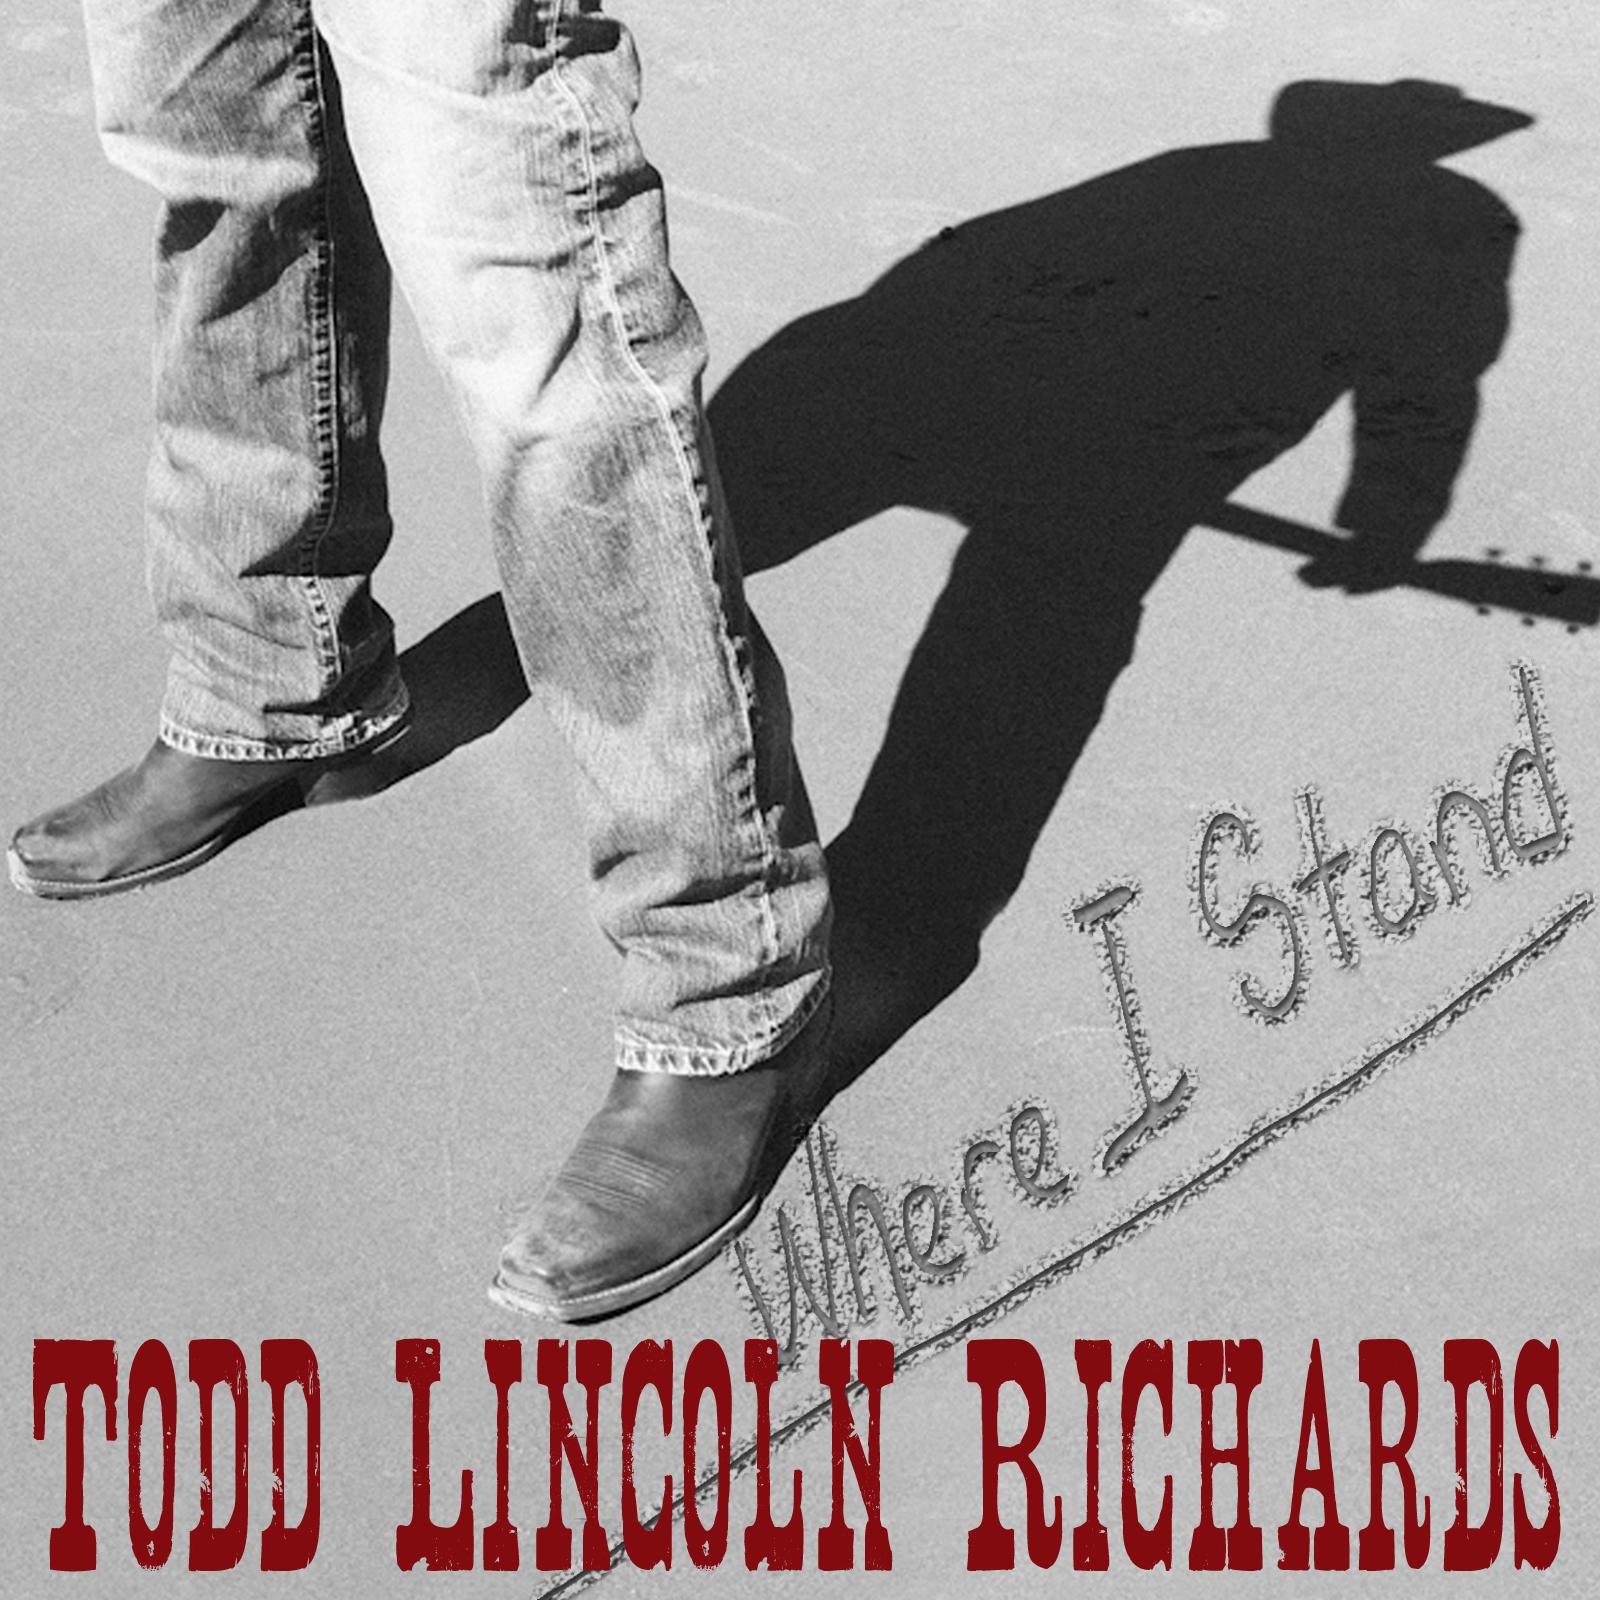 Todd Lincoln Richards 'Where I Stand' album cover